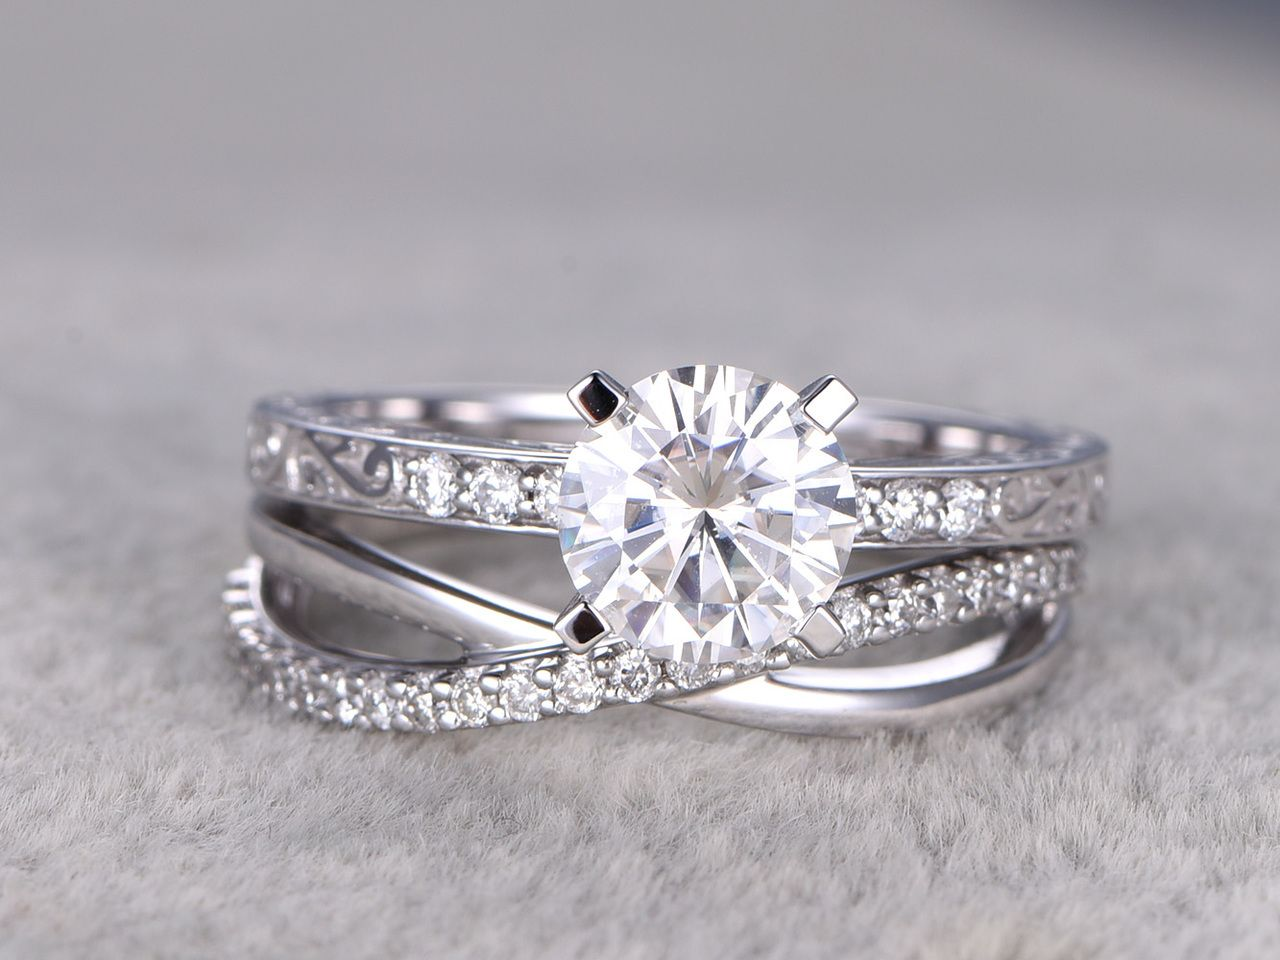 spectacular pcs moissanite wedding ring set diamond matching band white gold infinity loop curved pave stacking - Infinity Wedding Ring Set